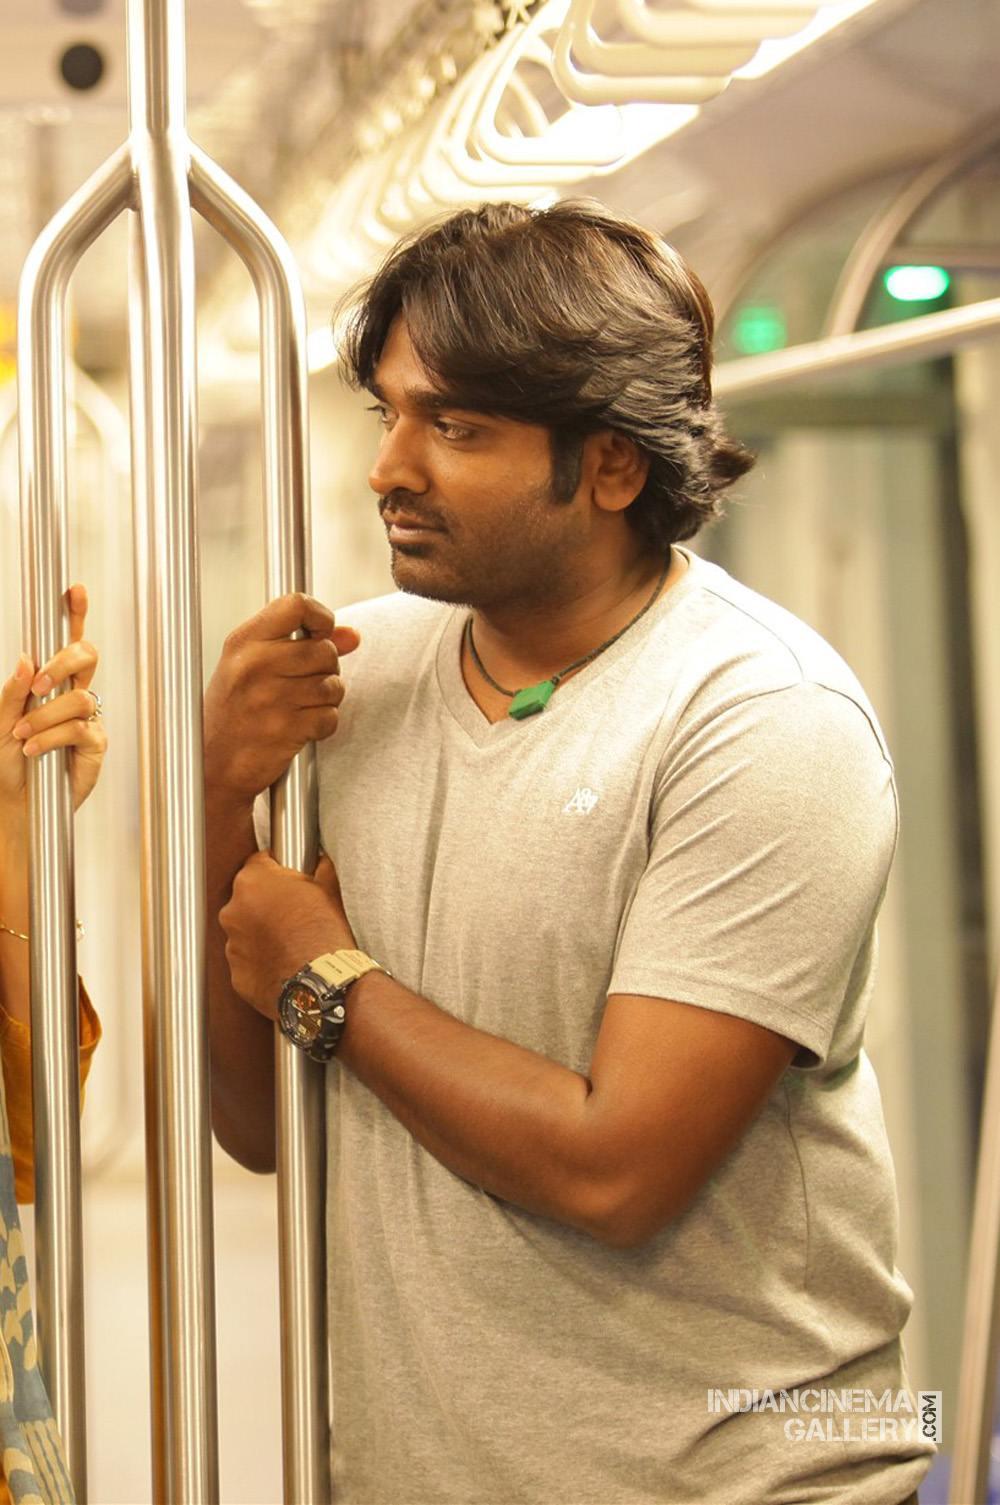 Vijay Sethupathi In 96 Movie 96 Movie In Tamil 1000x1505 Wallpaper Teahub Io Best and latest vijay sethupathi hd stills, hd images, actor vijay sethupathi hindi film hd pics, vijay sethupathi new hd photos gallery. vijay sethupathi in 96 movie 96 movie